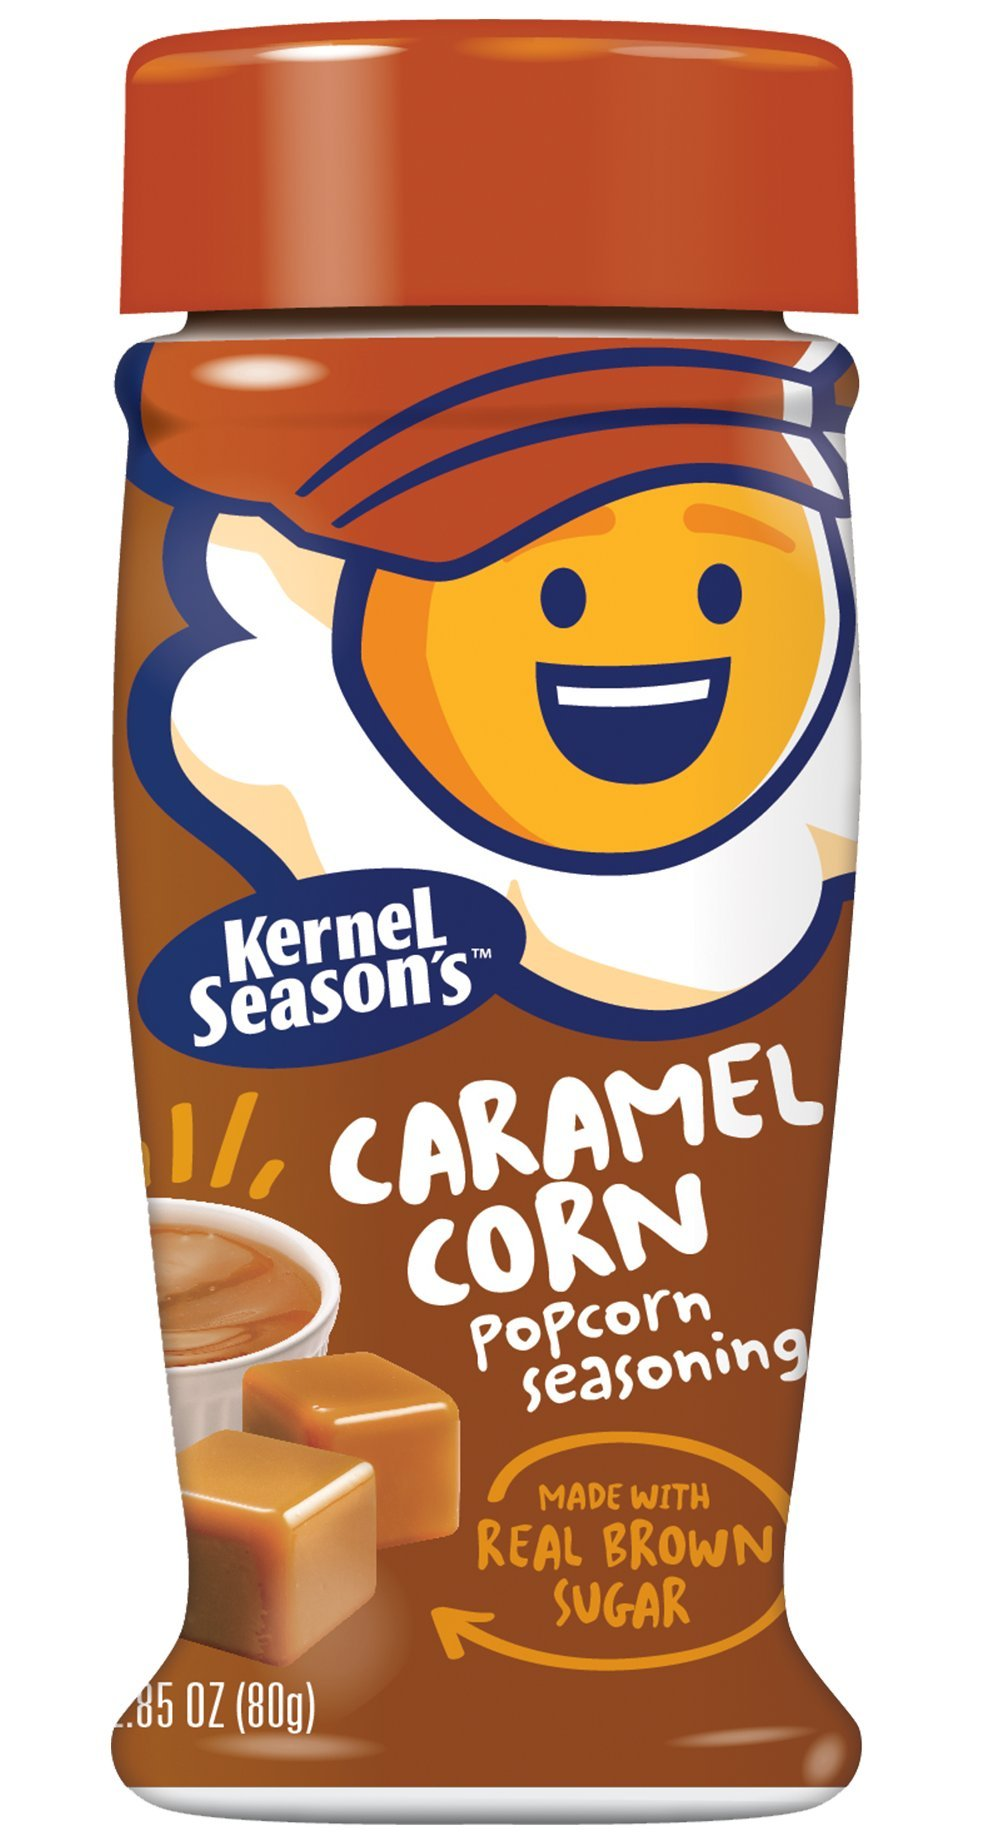 Kernel Season's Popcorn Seasoning, Caramel, 3 ounce (Pack of 6)